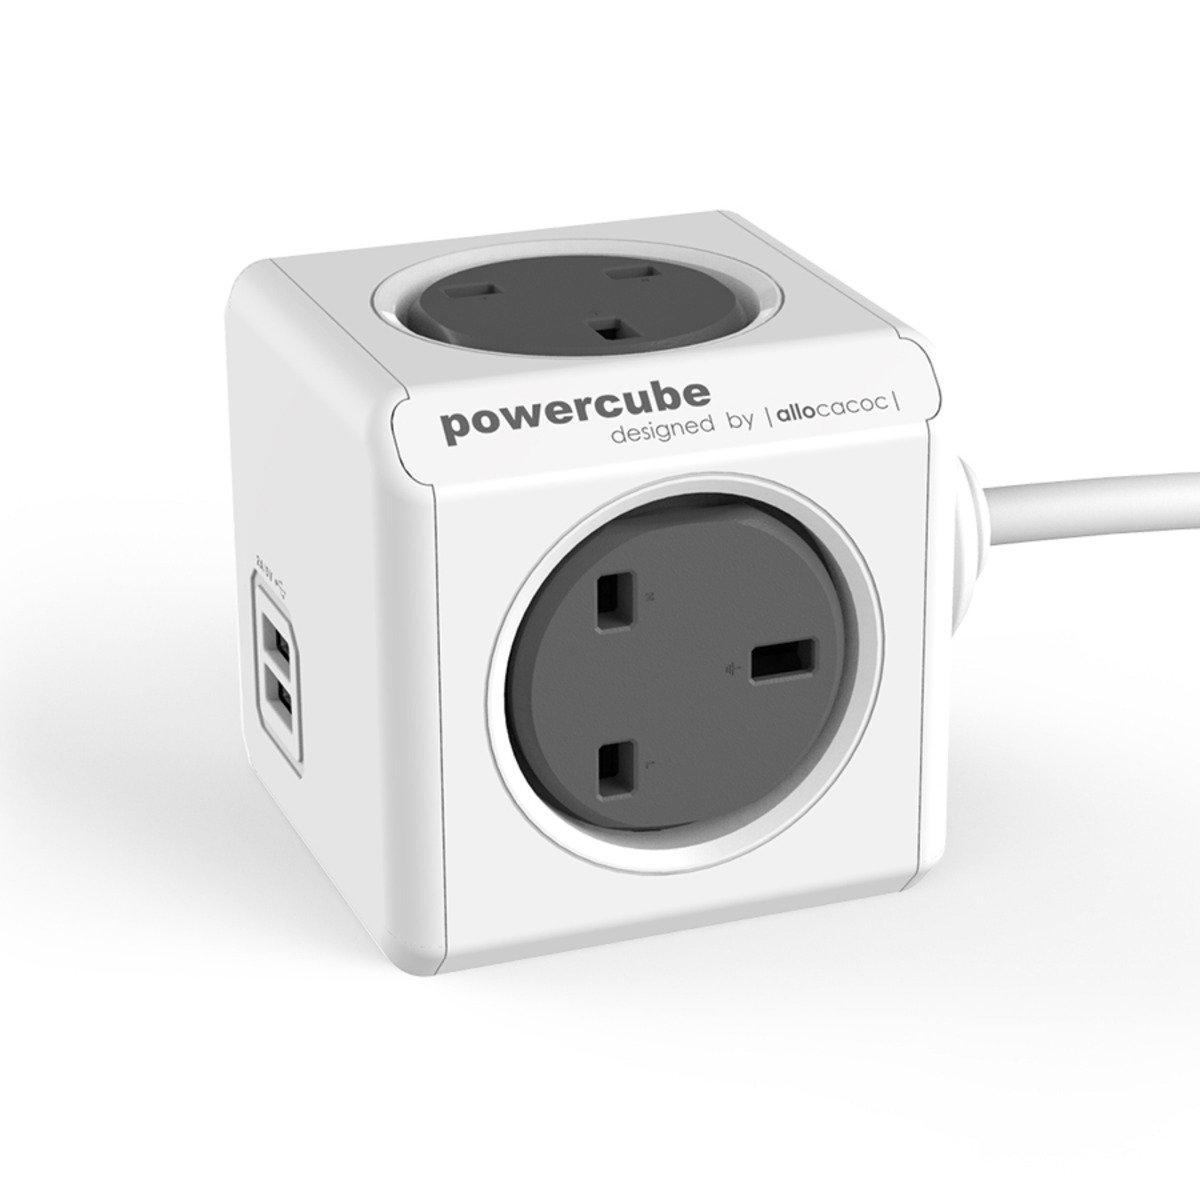 荷蘭 Allocacoc Powercube 4 插頭連2 USB (灰)